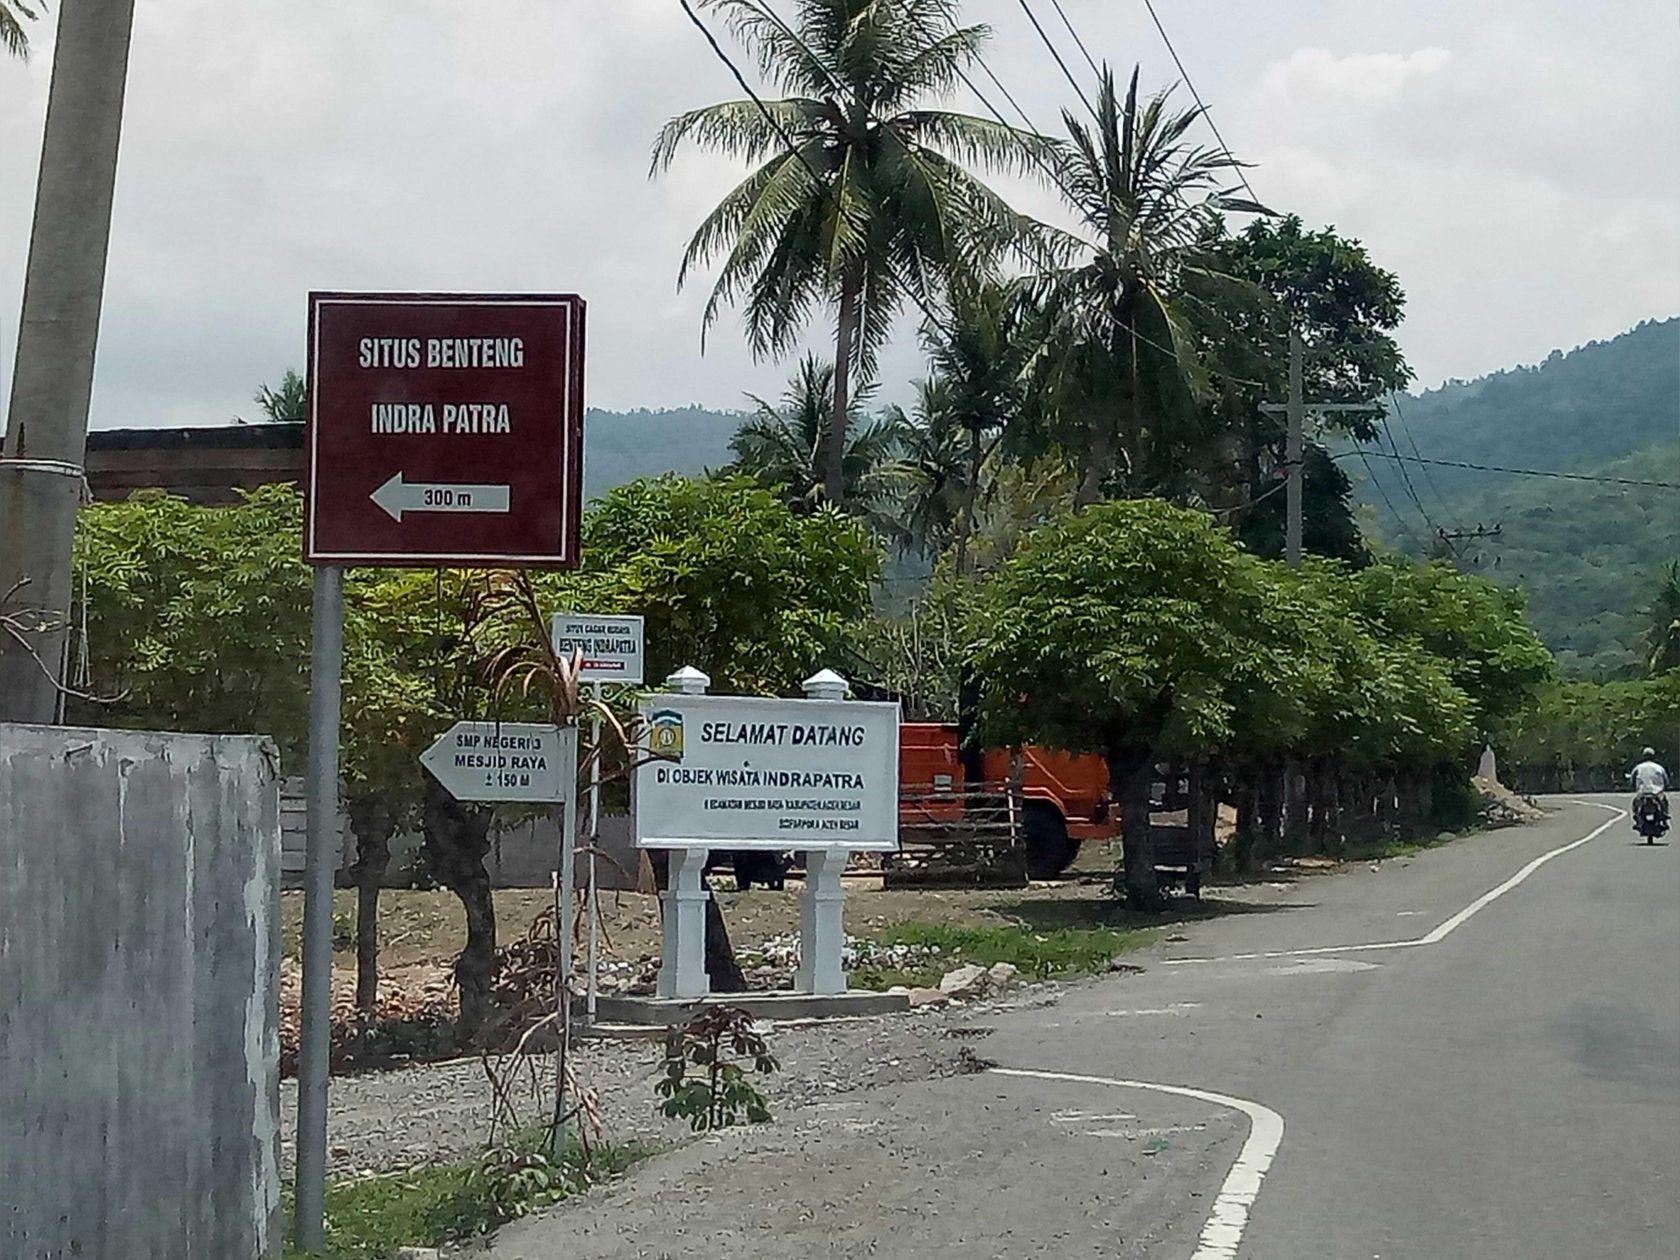 Misteri Indra Patra Steemit Kota Banda Aceh Benteng Tua Menyimpan